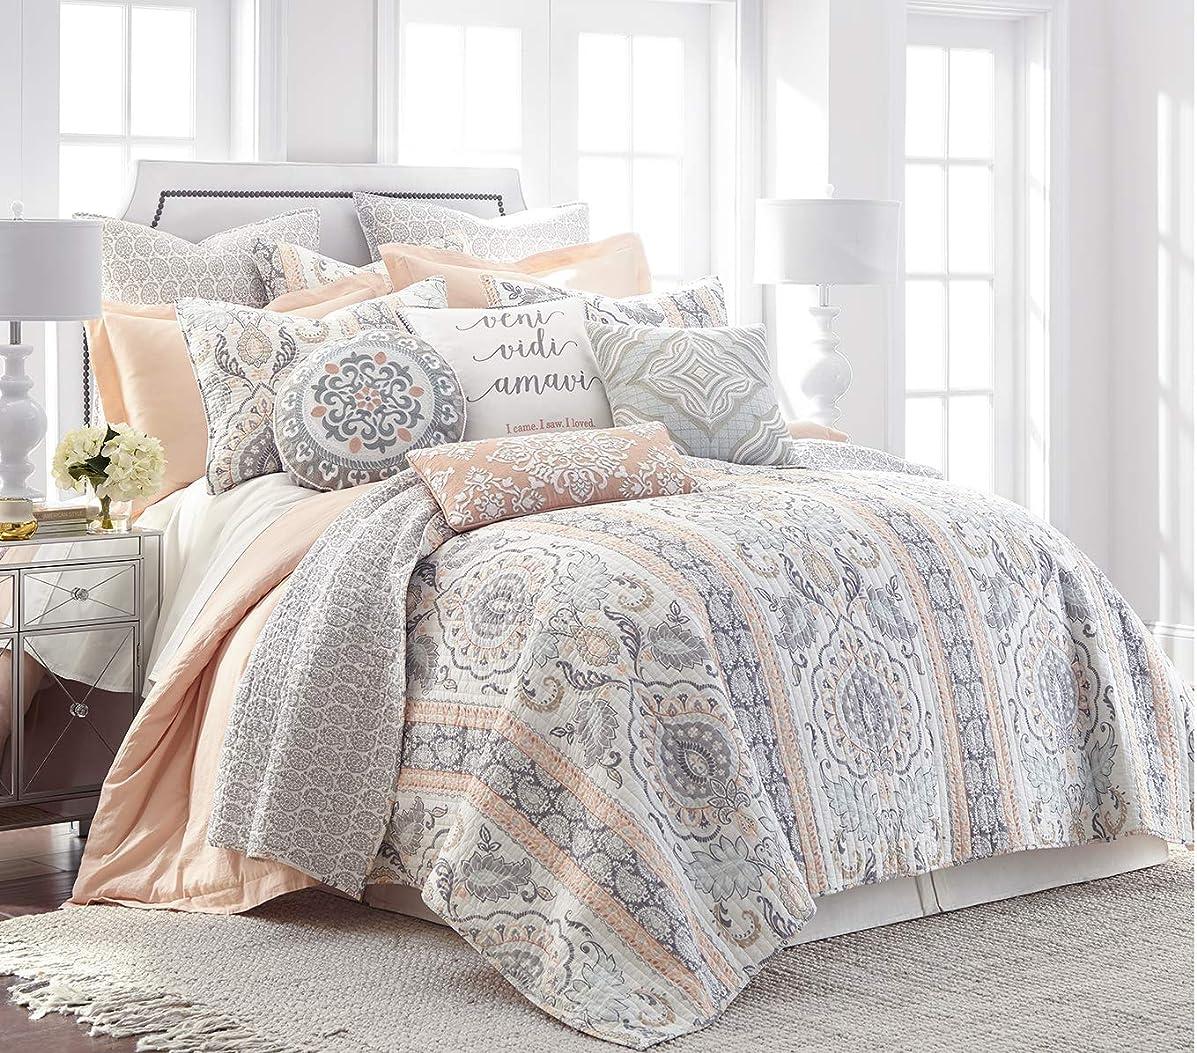 Levtex Home Darcy Full/Queen Quilt Set